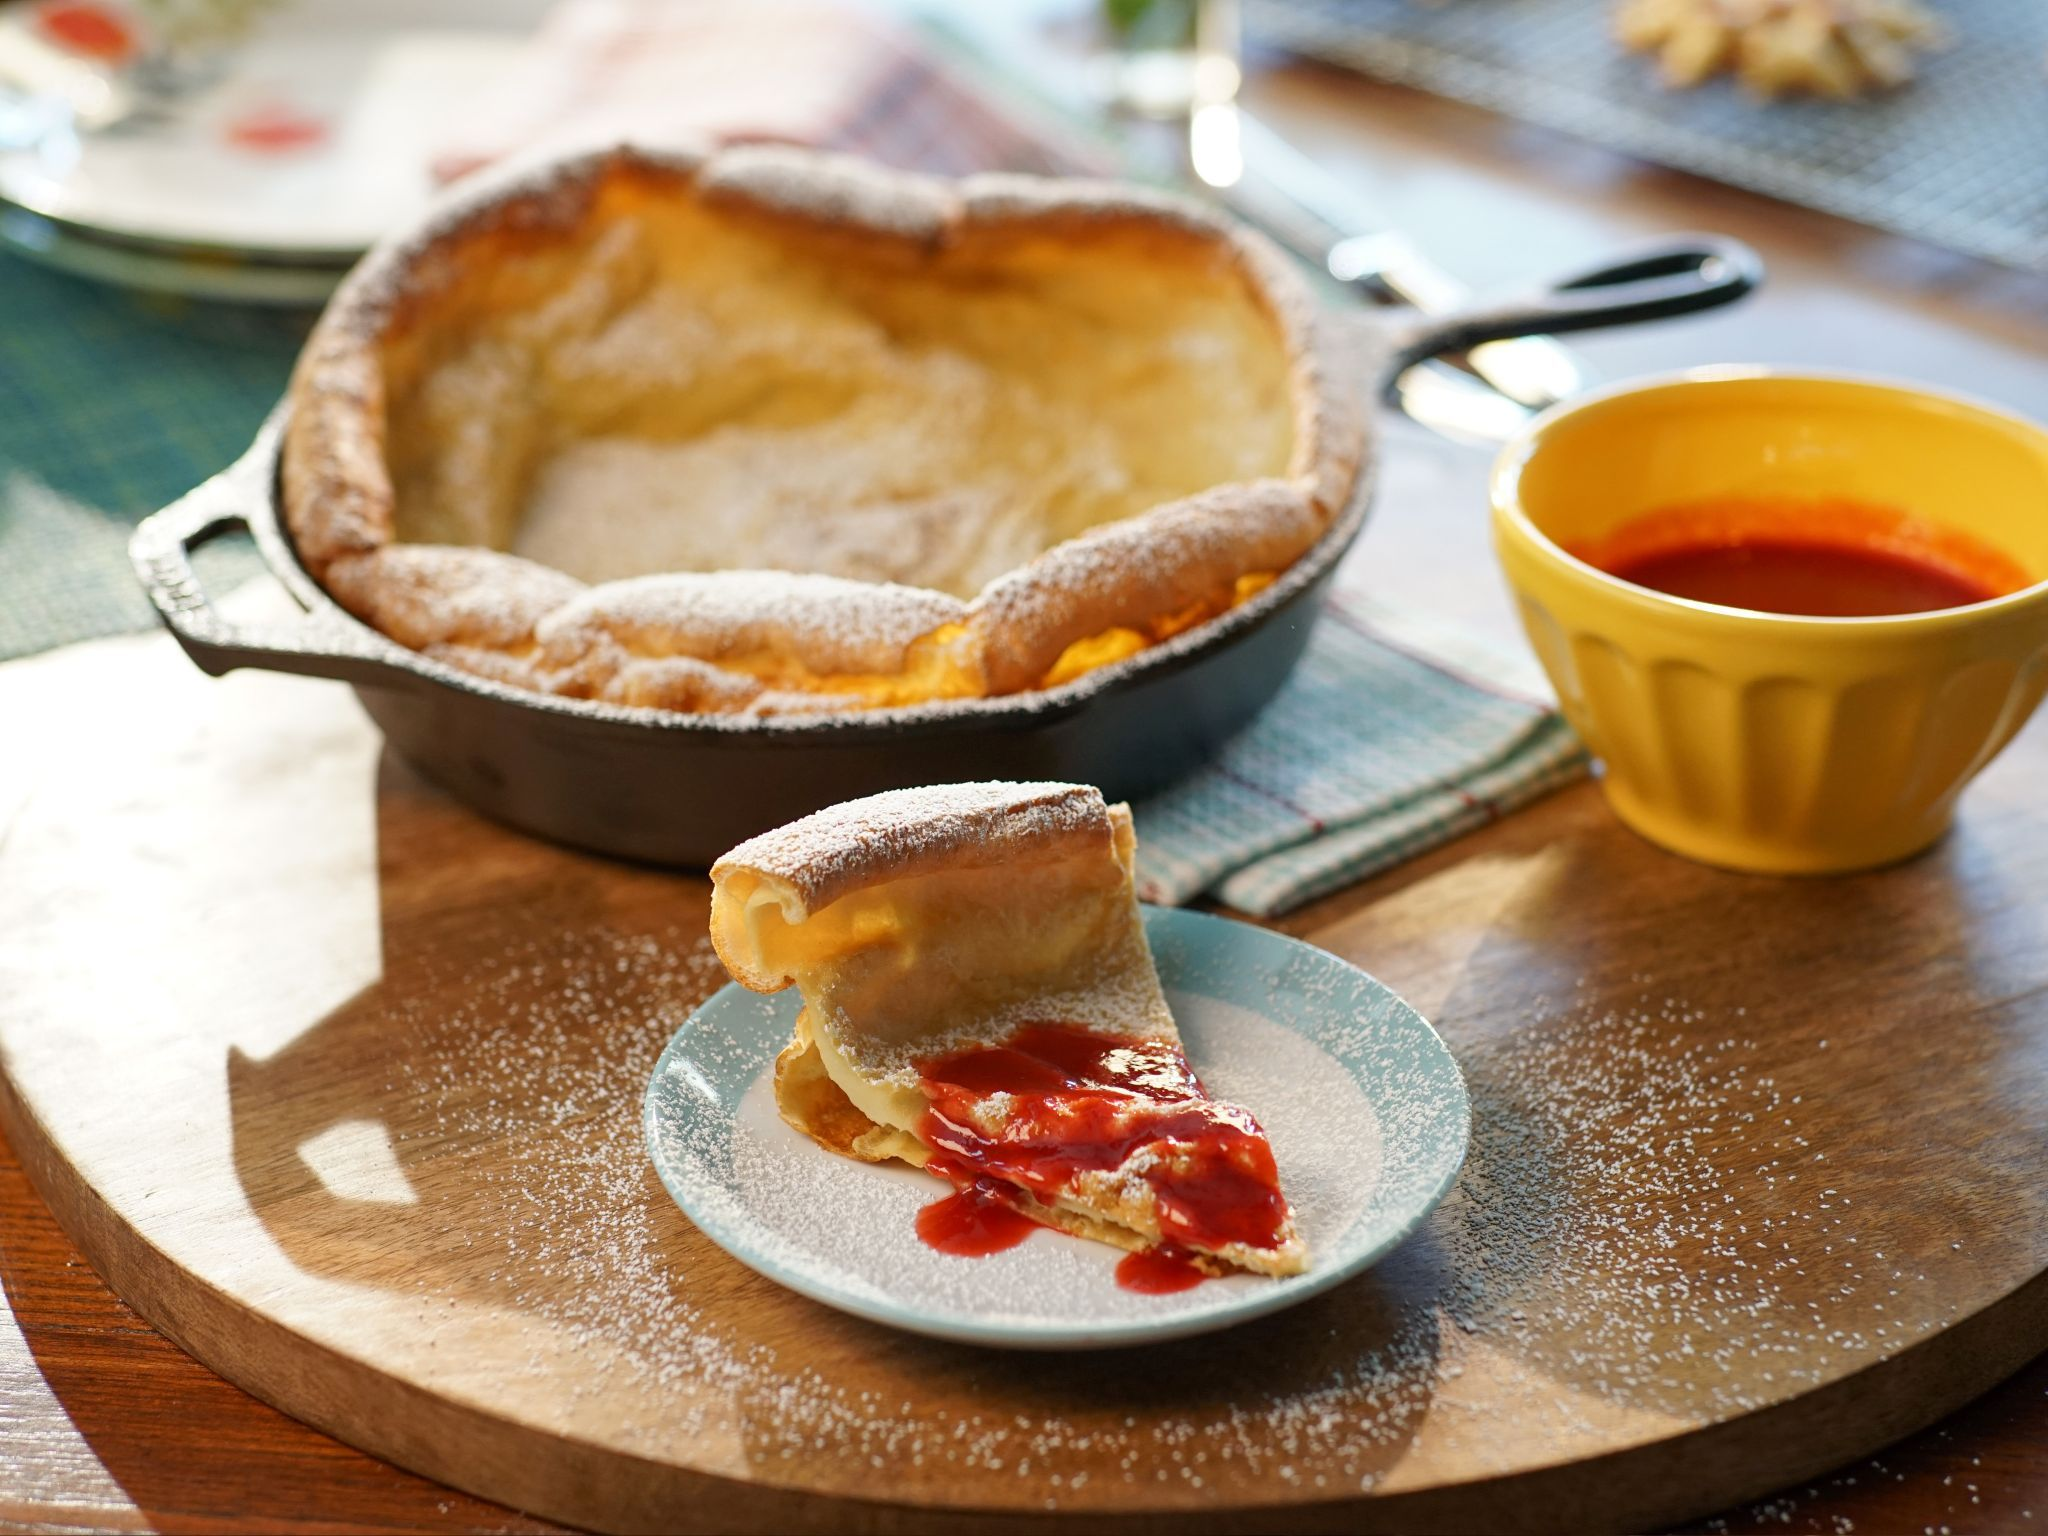 Dutch Baby Pancake with Raspberry-Orange Coulis recipe from Valerie Bertinelli via Food Network #valeriebertinellirecipes